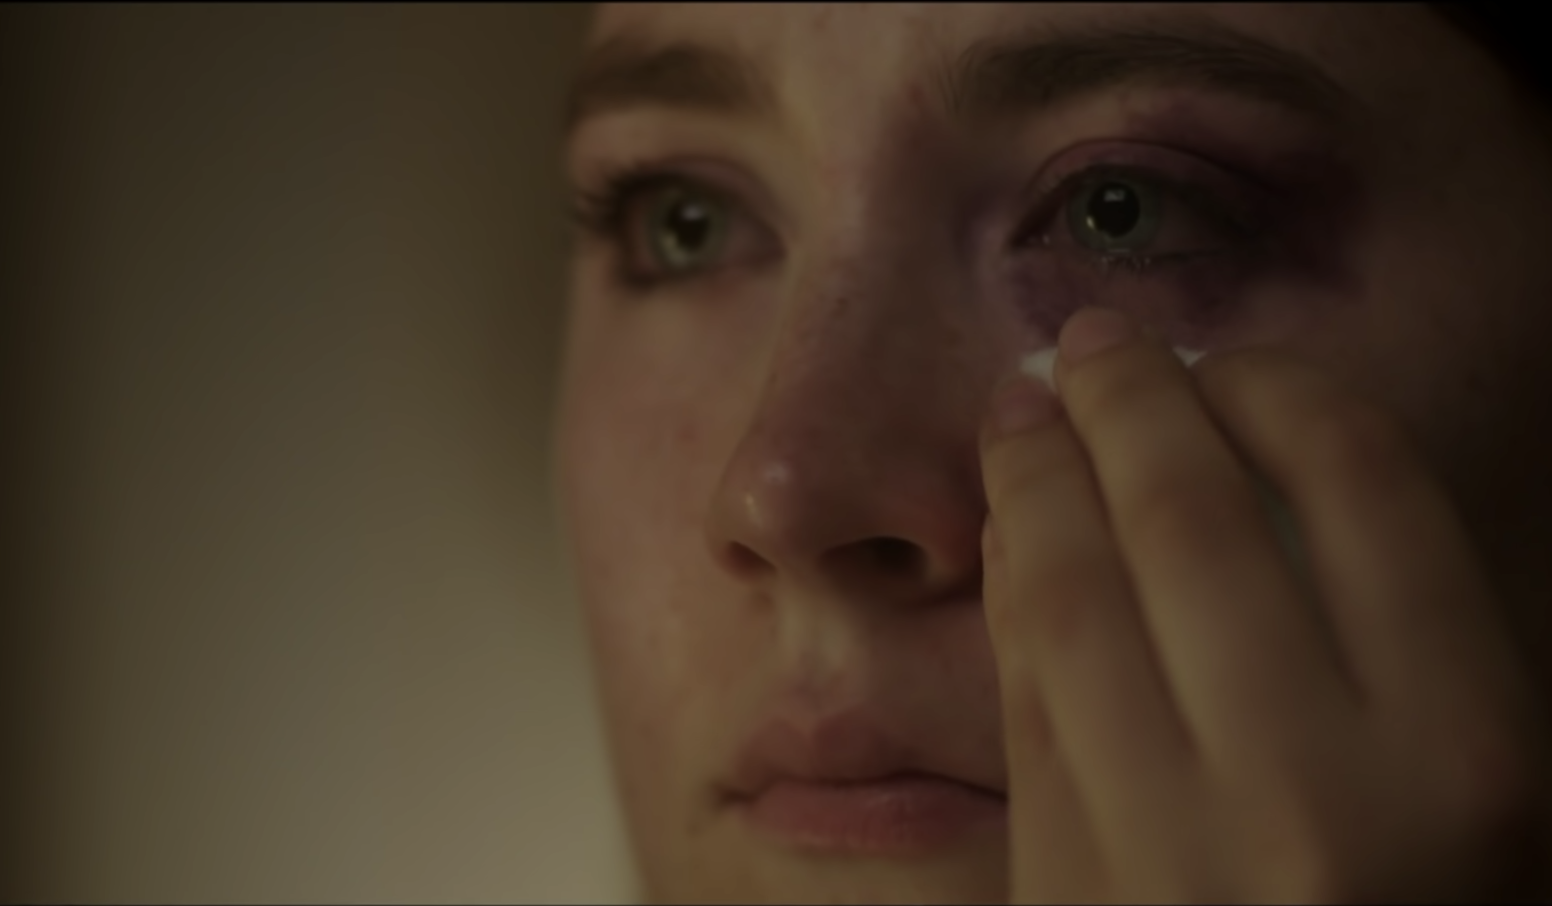 Saoirse Ronan covering up a black eye